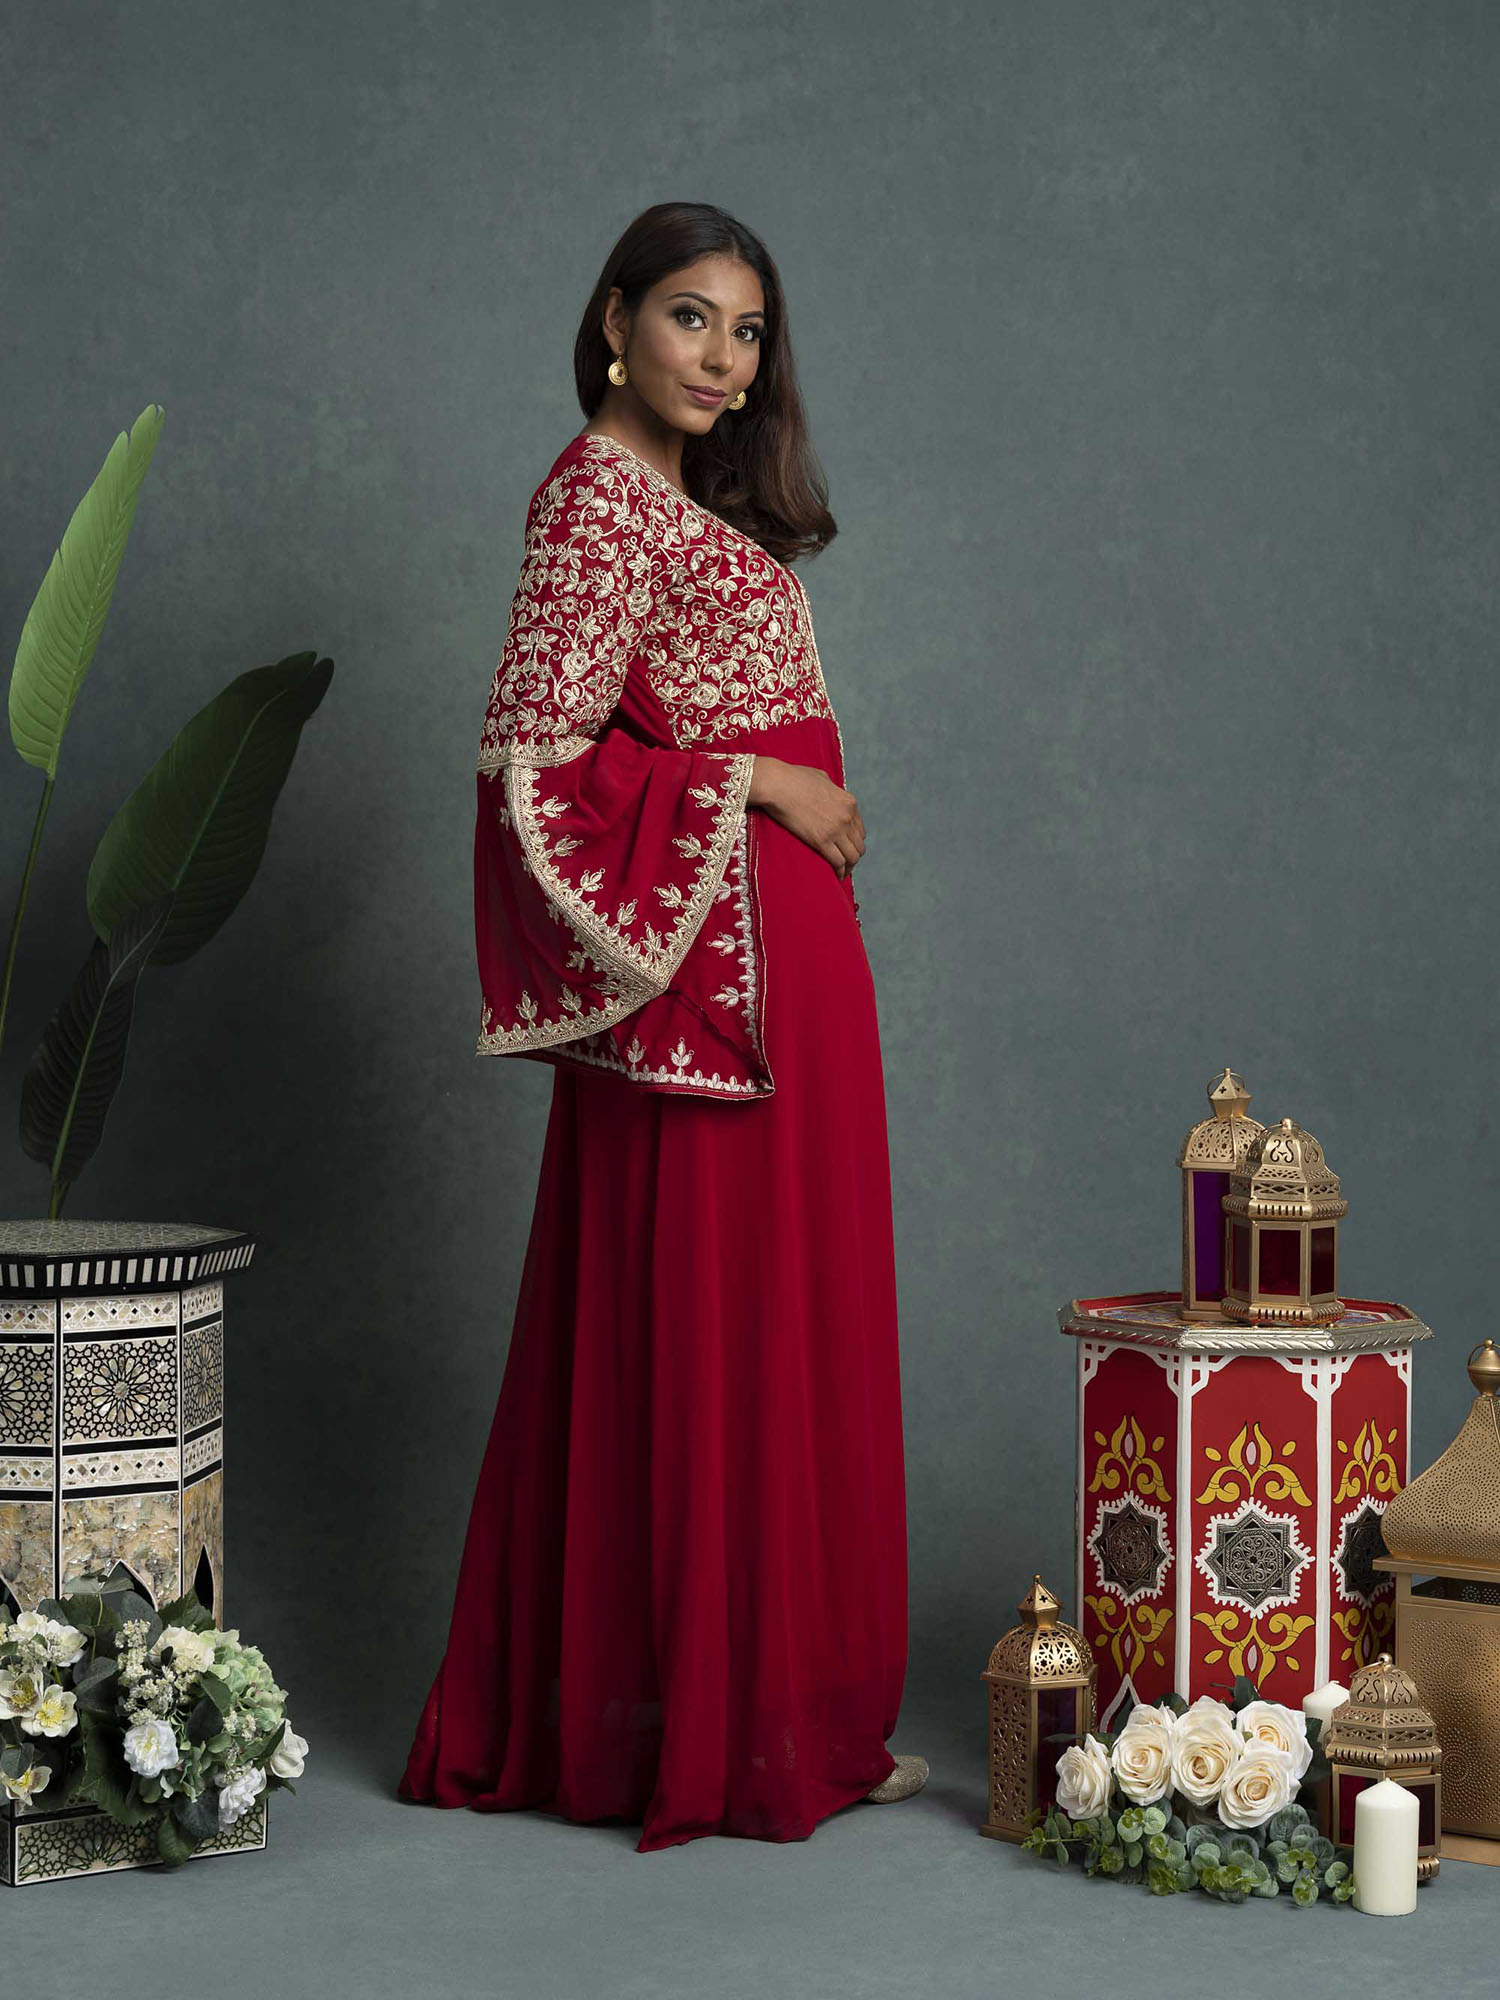 Fashion Photography Maghrebi Clothing Singapore Product Photographer COCO Creative Studio 7